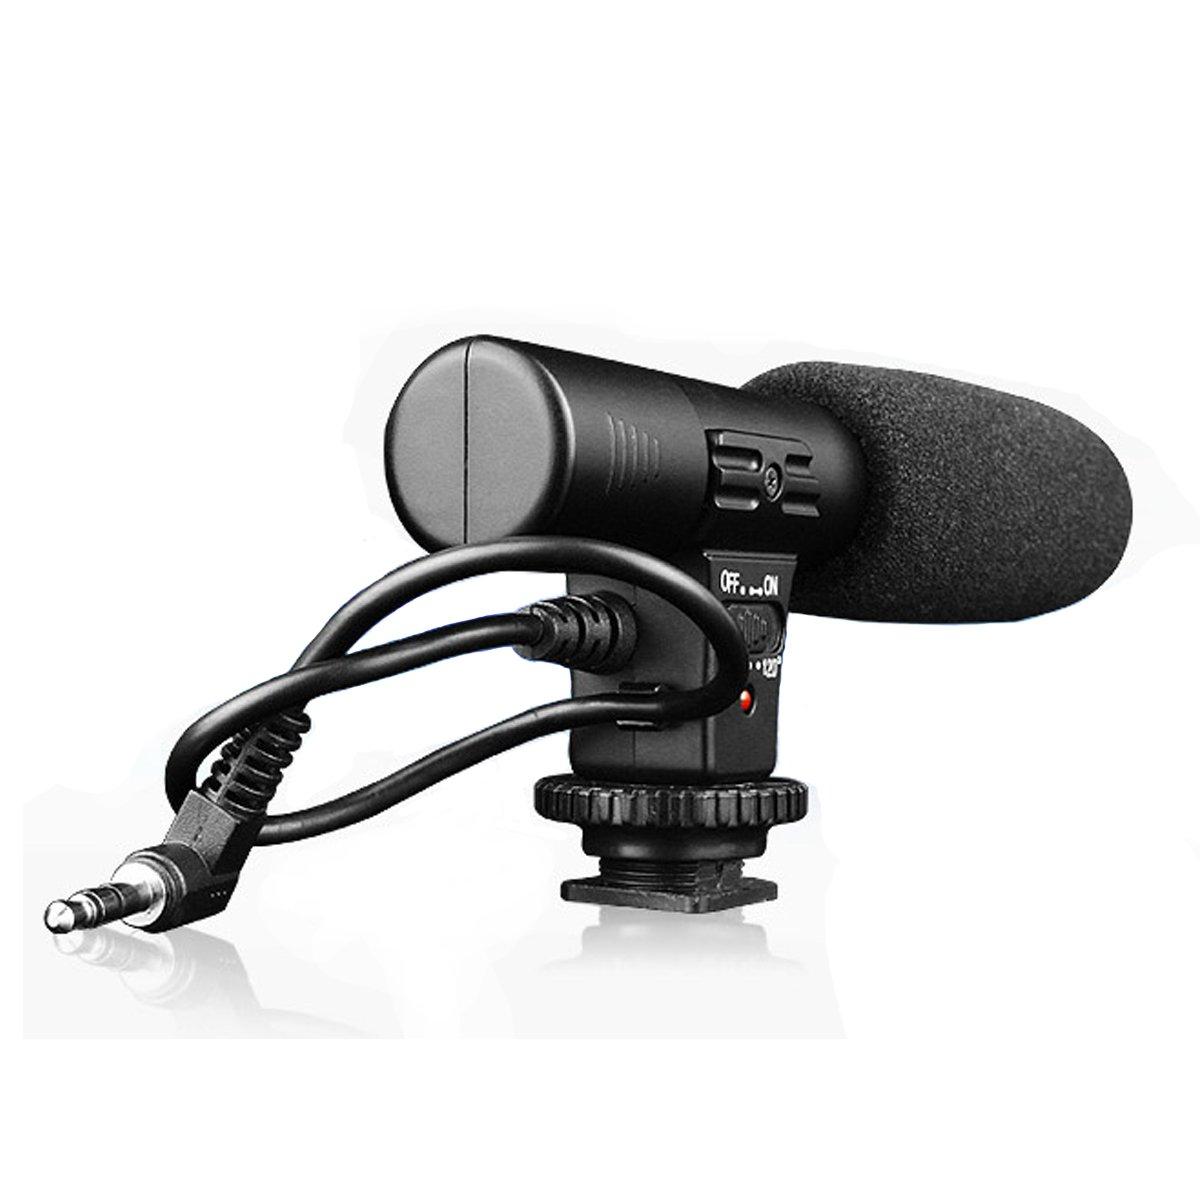 SmilePowo Camera Microphone, EIVOTOR Mic-01 3.5mm Digital Video Recording Microphone for D-SLR Camera, Stereo Shotgun Recording Microphone for Digital SLR Camera,Nikon/Canon Camera/DV Camcorder